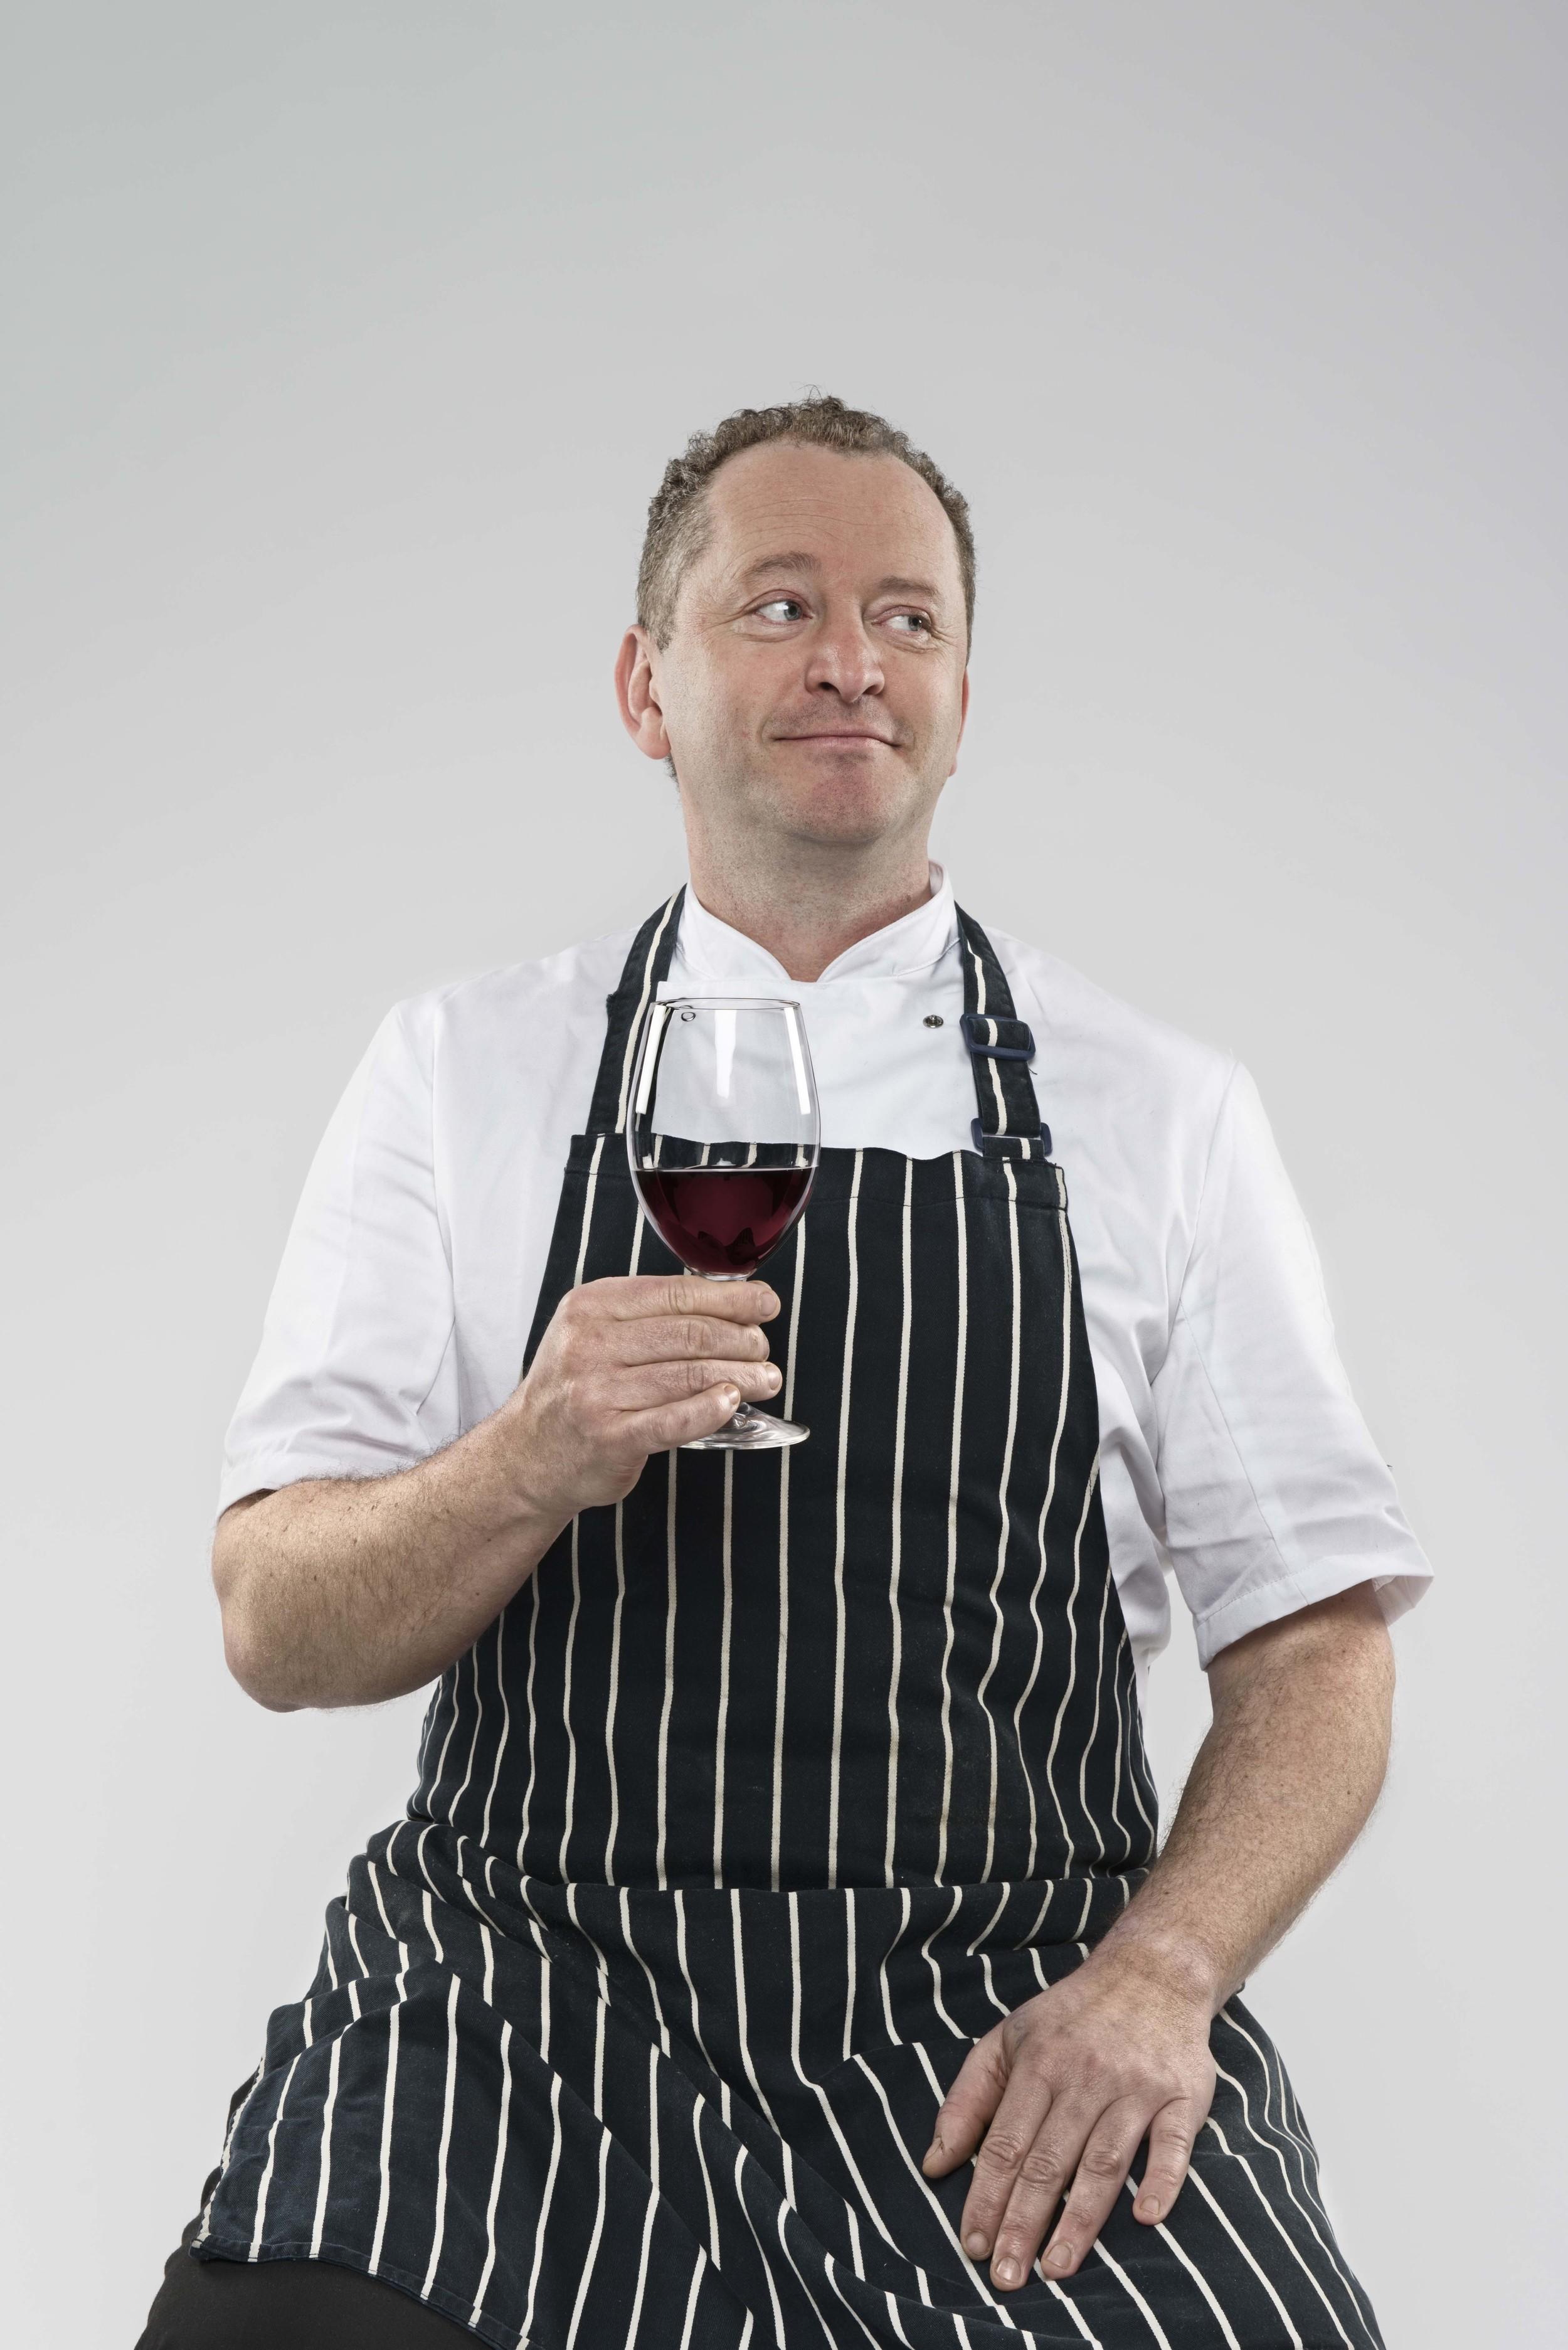 Neil will hopefully enjoy a nice glass of red on Sunday!